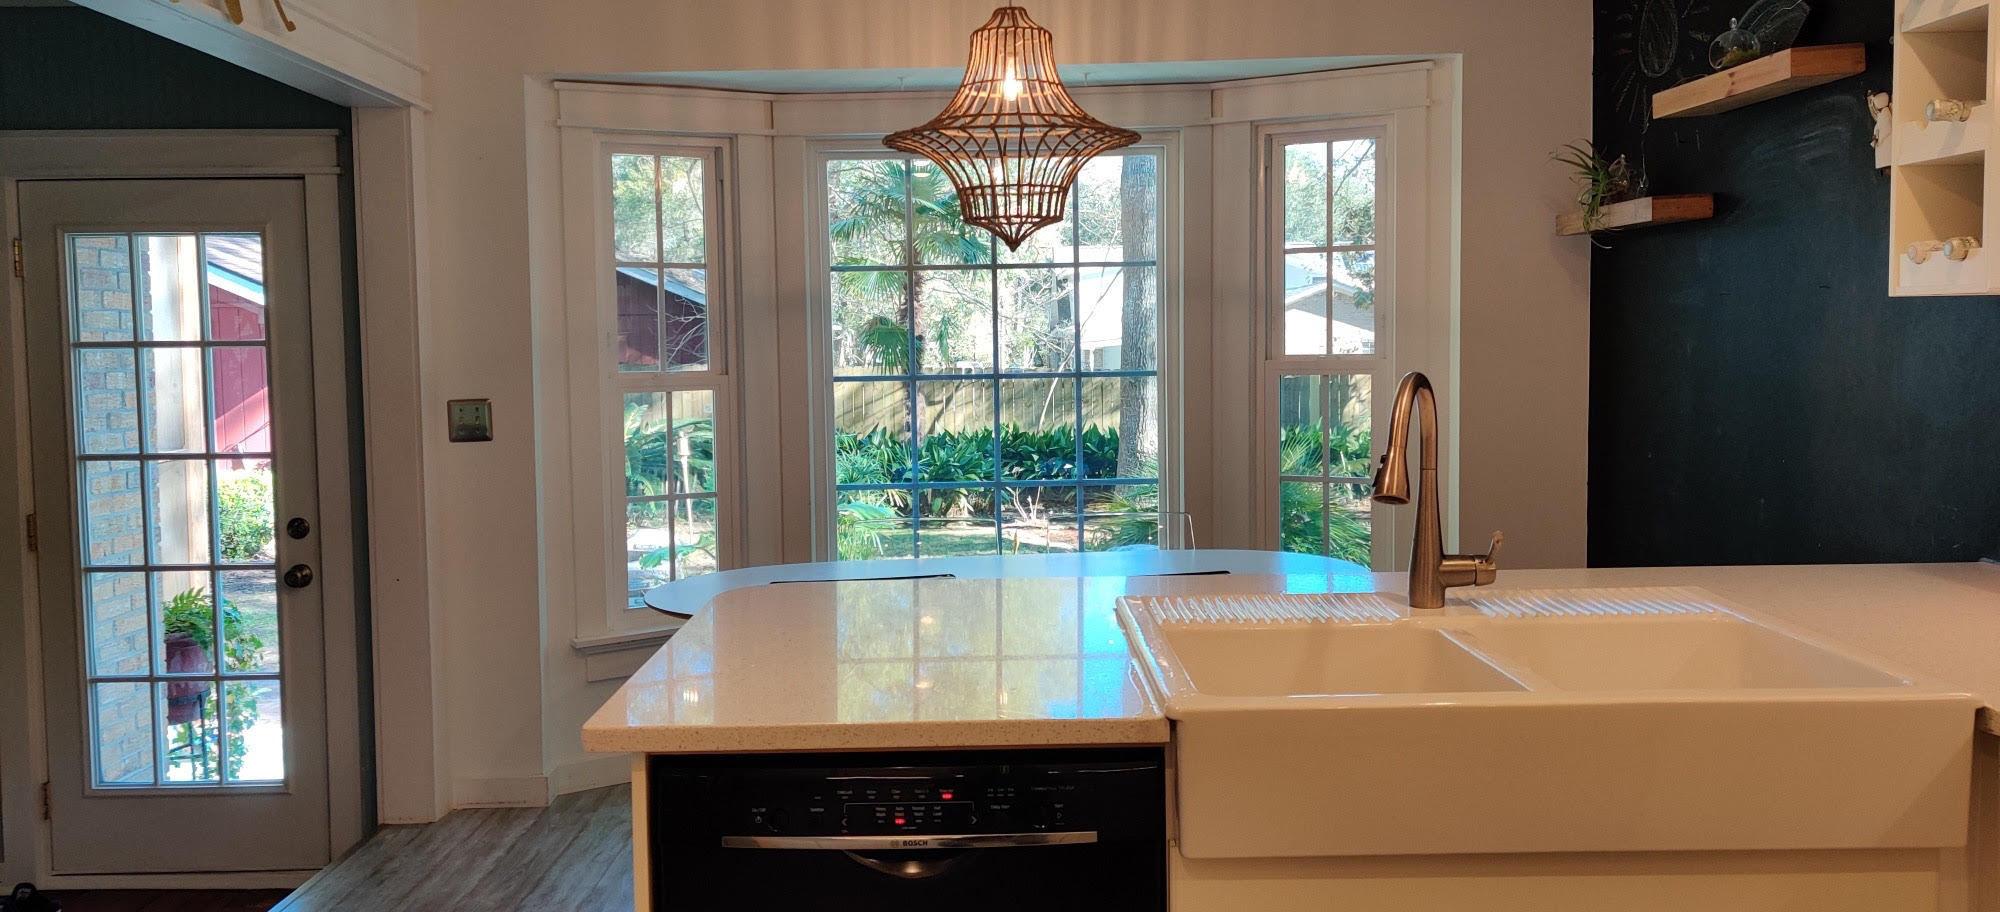 Shemwood II Homes For Sale - 950 Sea Gull, Mount Pleasant, SC - 13